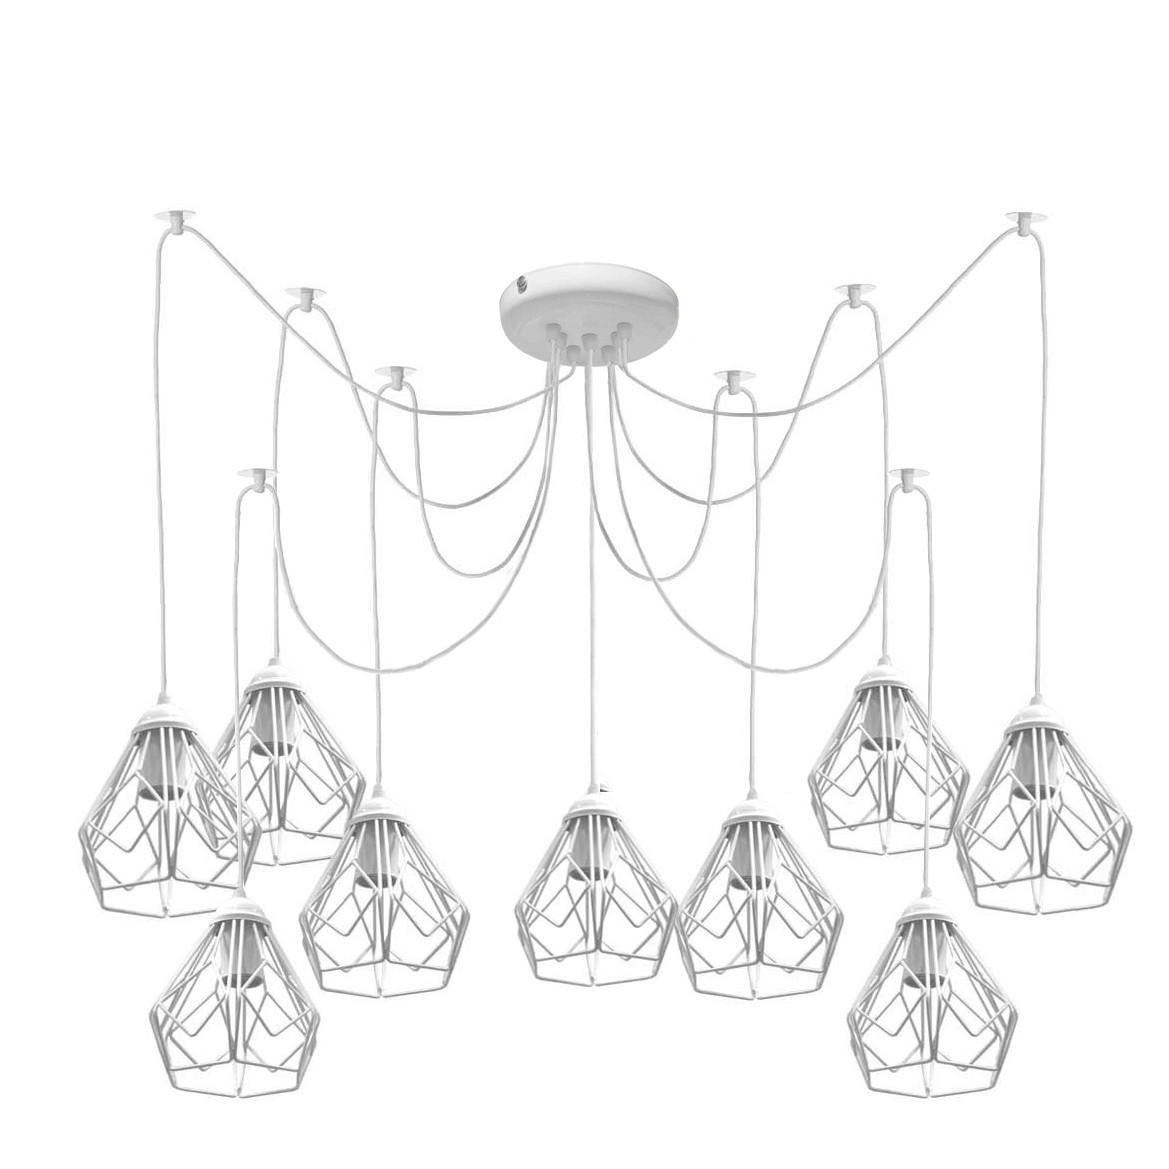 Люстра паук на девять плафонов NL 538-9 W  MSK Electric